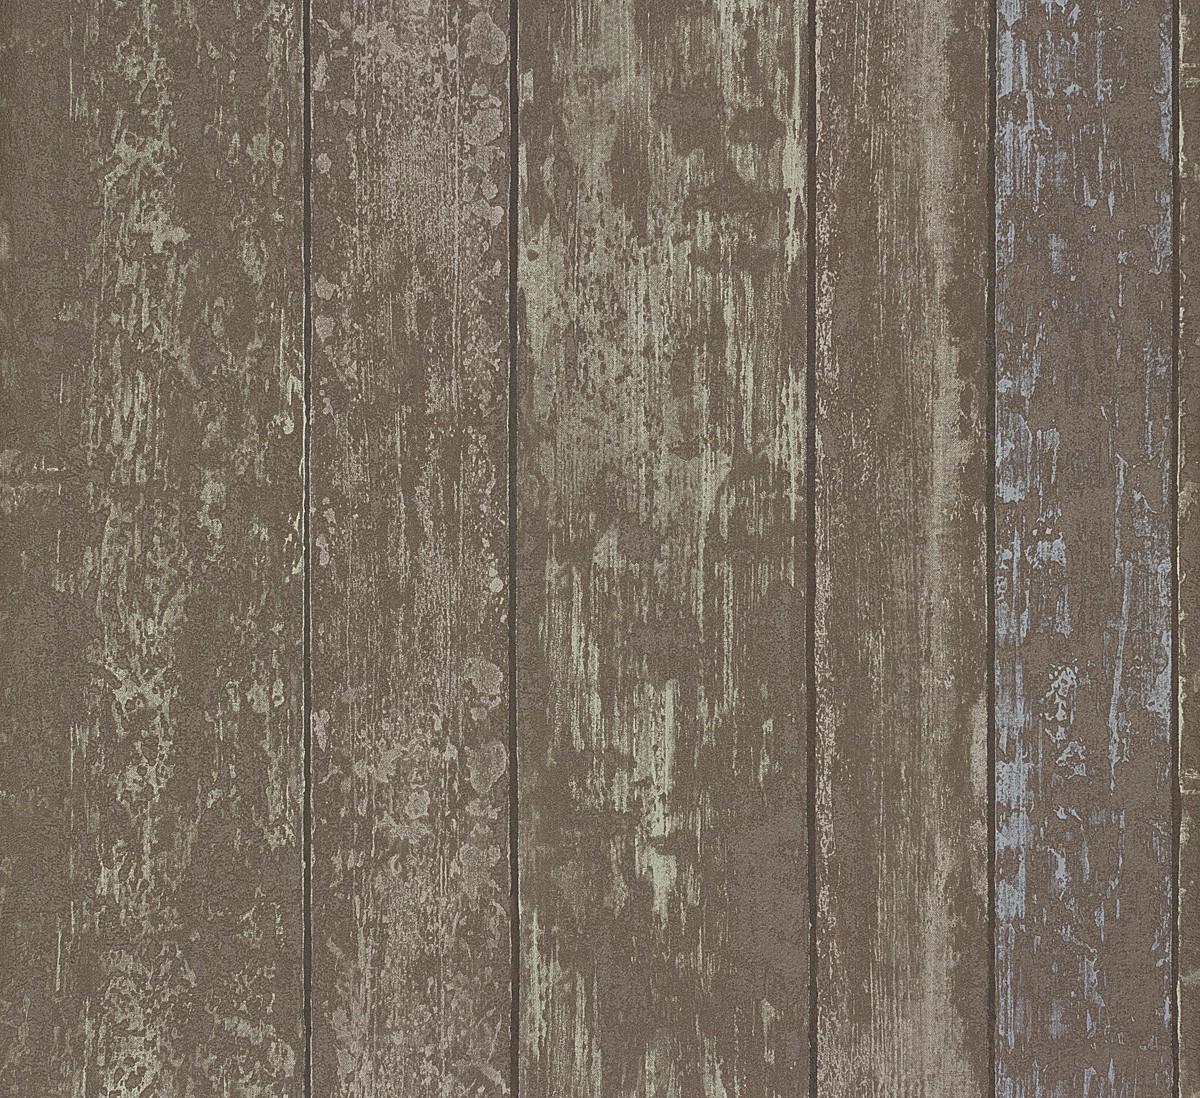 Rasch Tapeten Home Style : Details zu Tapete Vlies Holz braun Rasch Home Style 859614